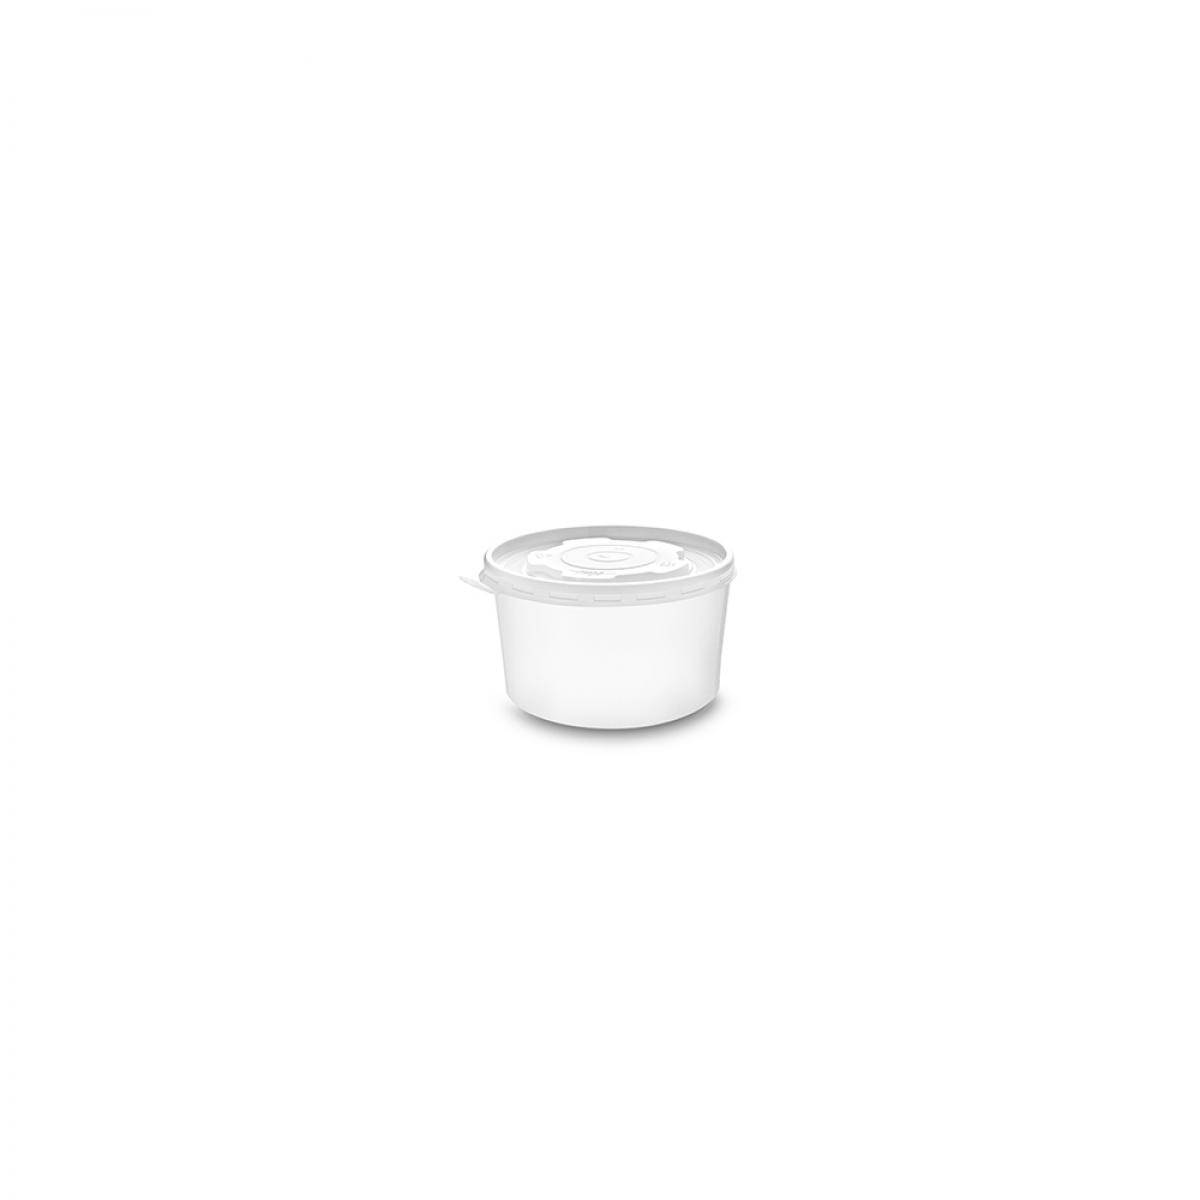 SOUFFLE CUPS (PET) 4 OZ W/LID